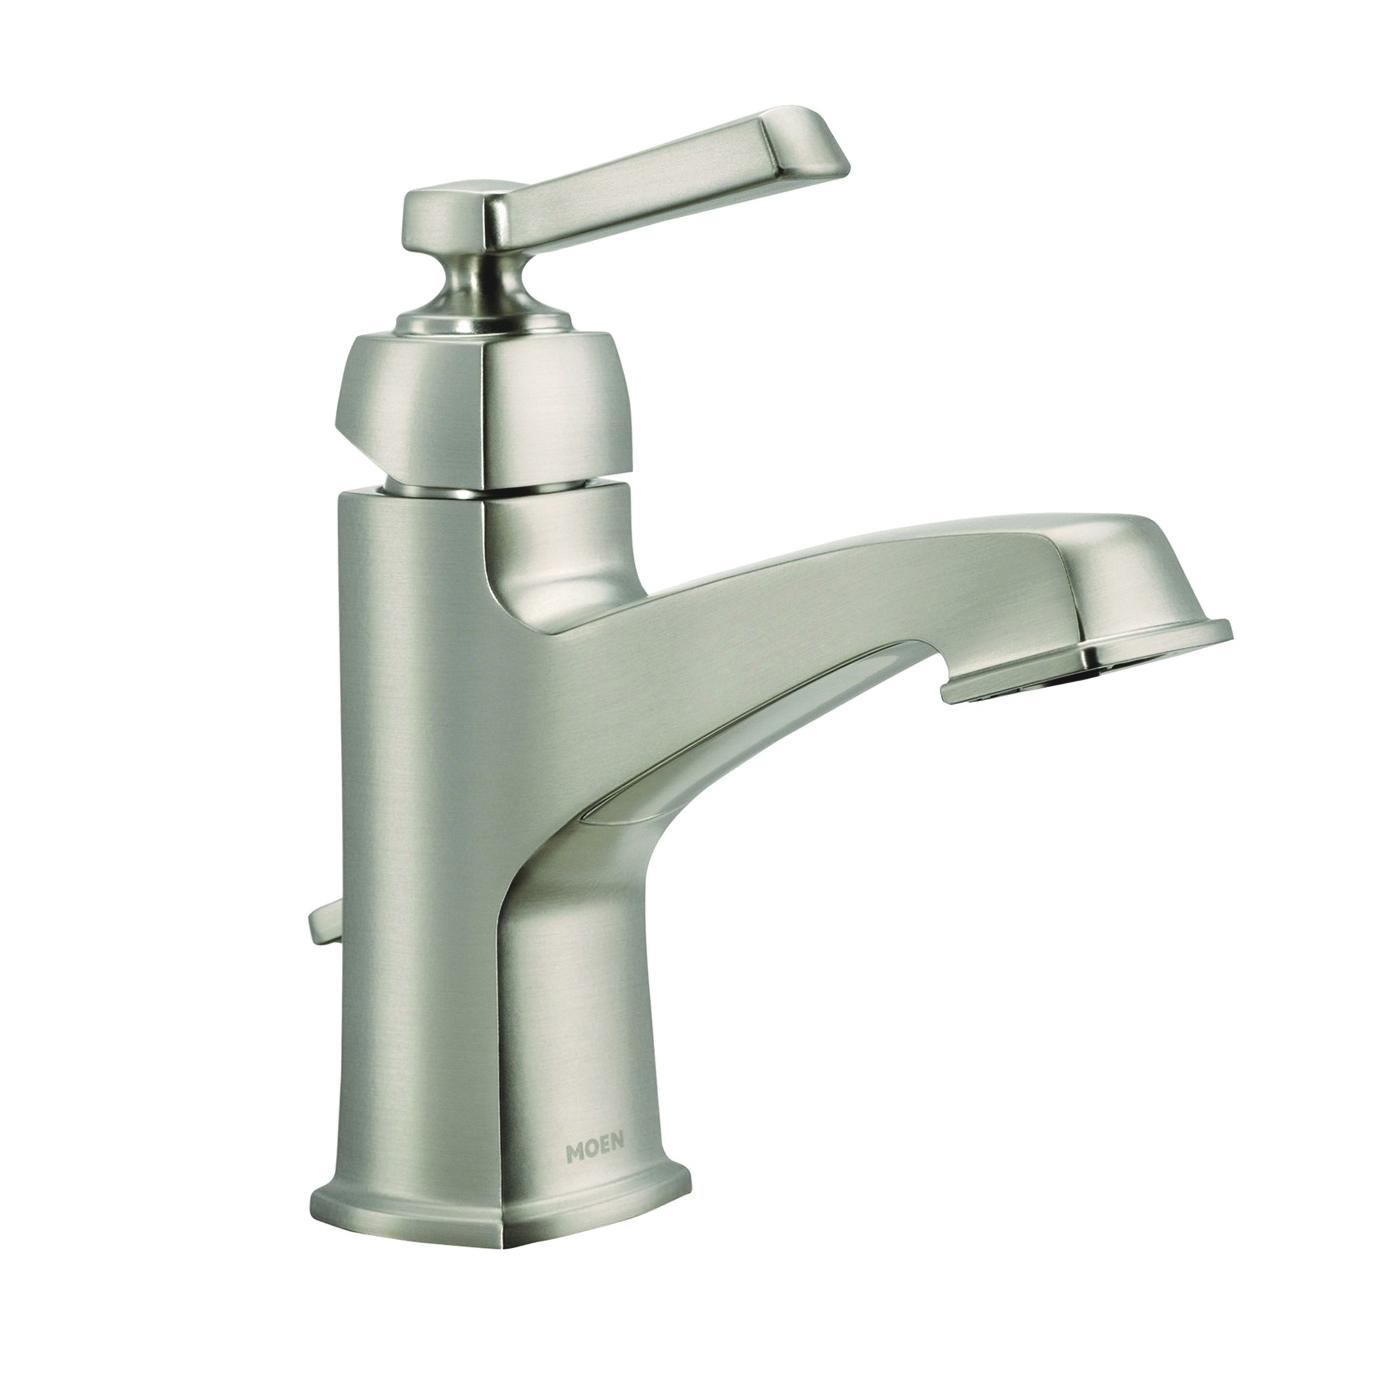 Picture of Moen Boardwalk WS84805SRN Bathroom Faucet, 1.2 gpm, 1-Faucet Handle, Metal, Brushed Nickel, Lever Handle